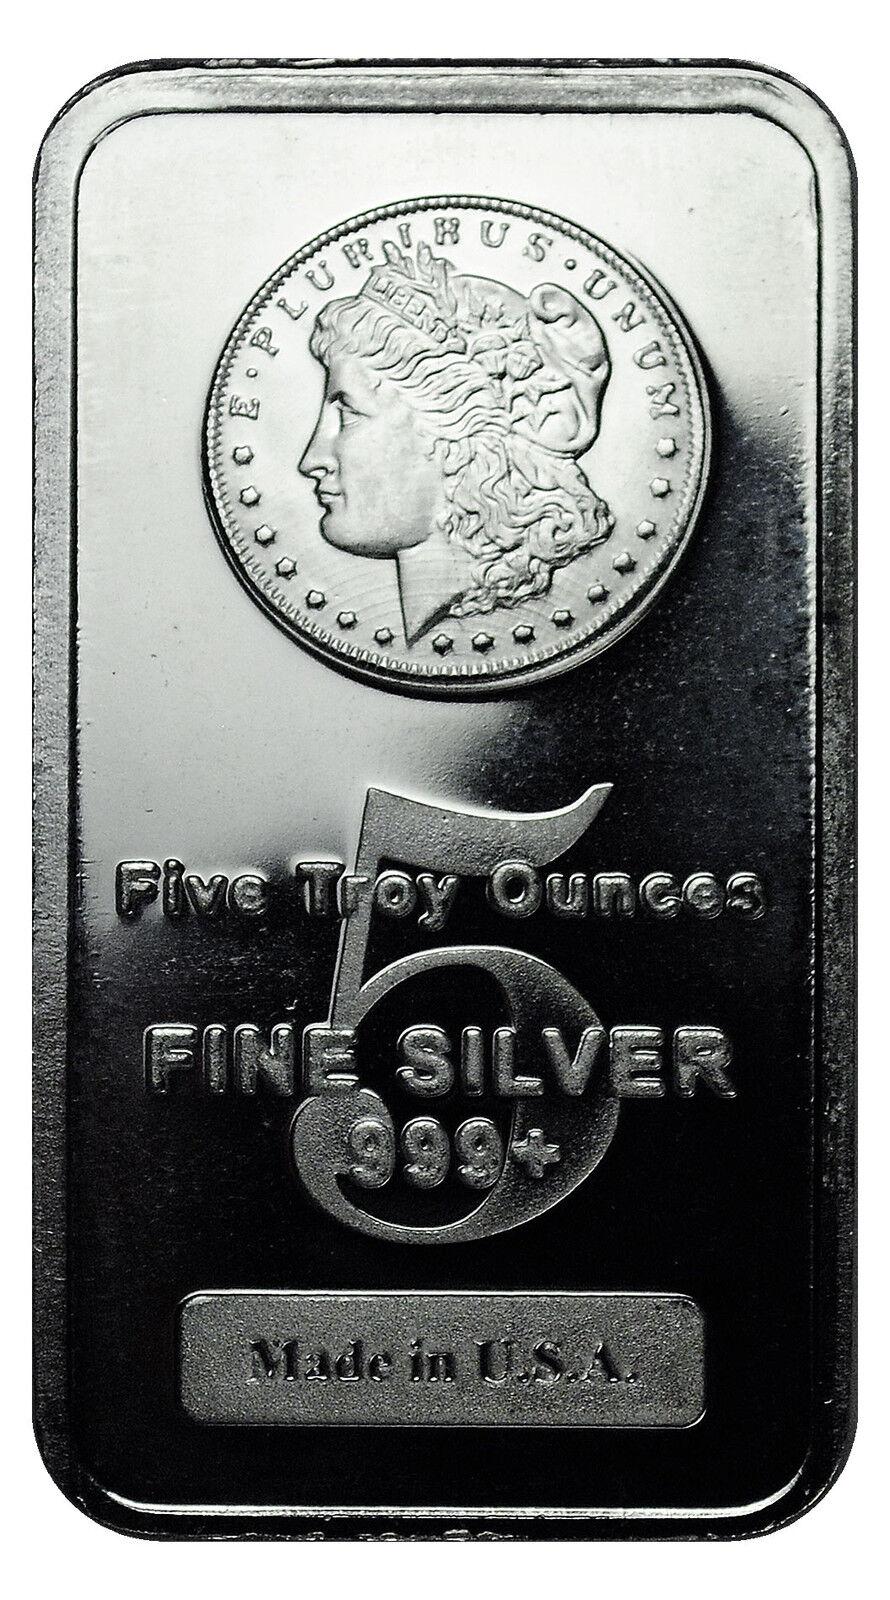 Daily Deal Morgan Dollar Design 5 Troy Ounce Silver Bar MADE IN USA SKU27205